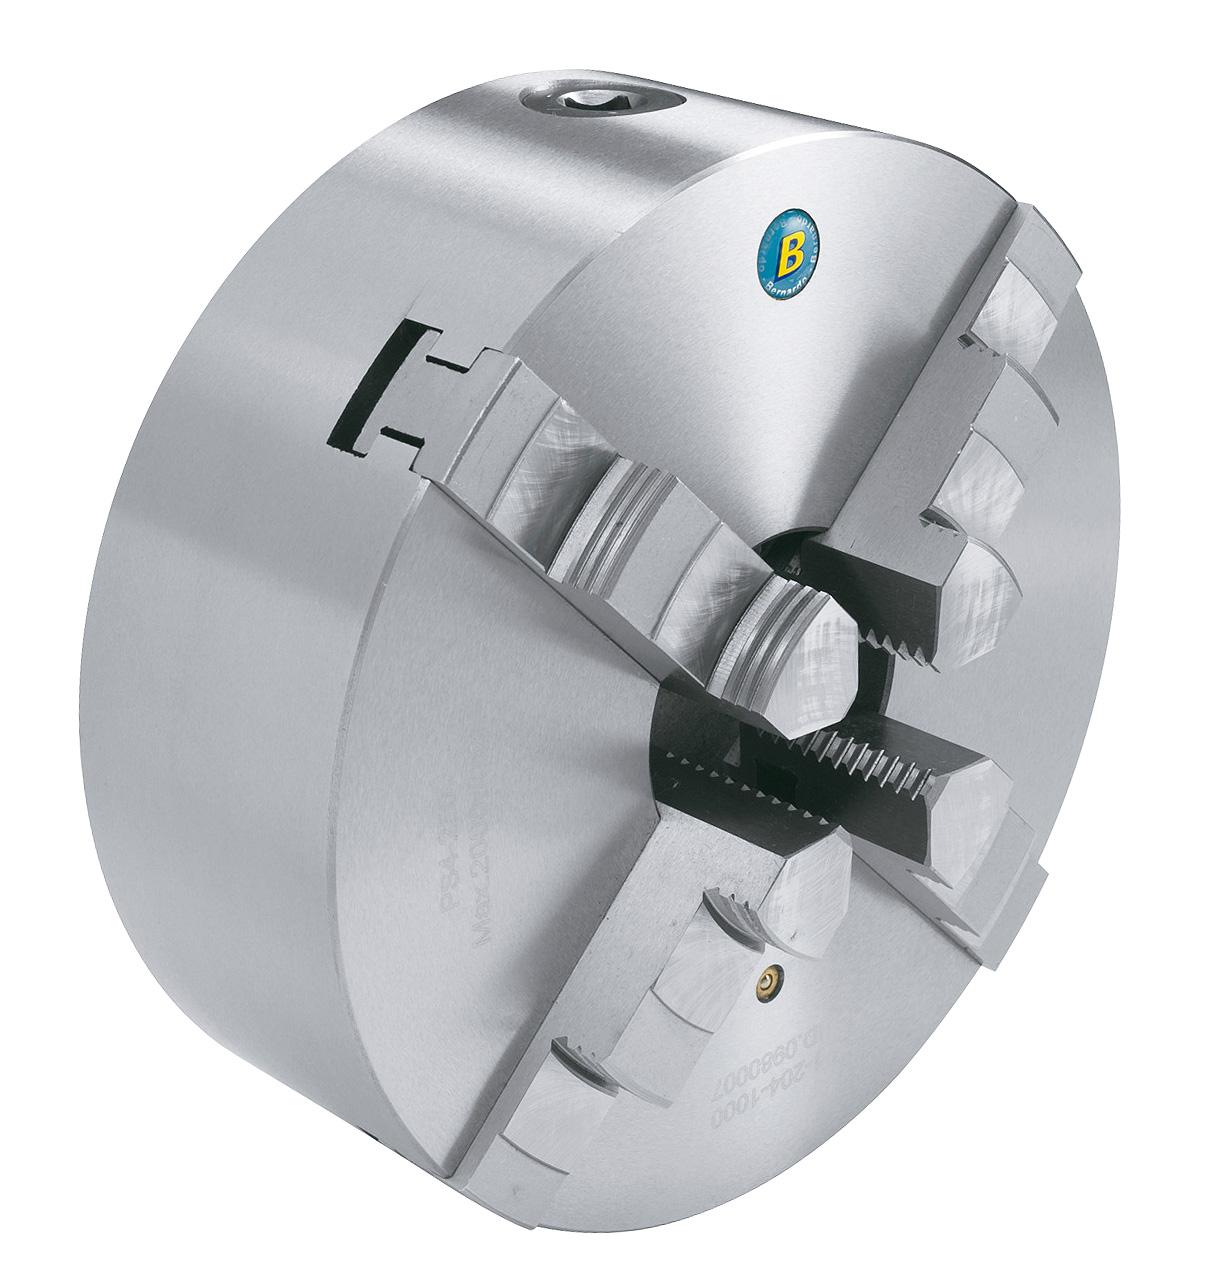 4 bakket centrerpatron standard DK12-125/D3